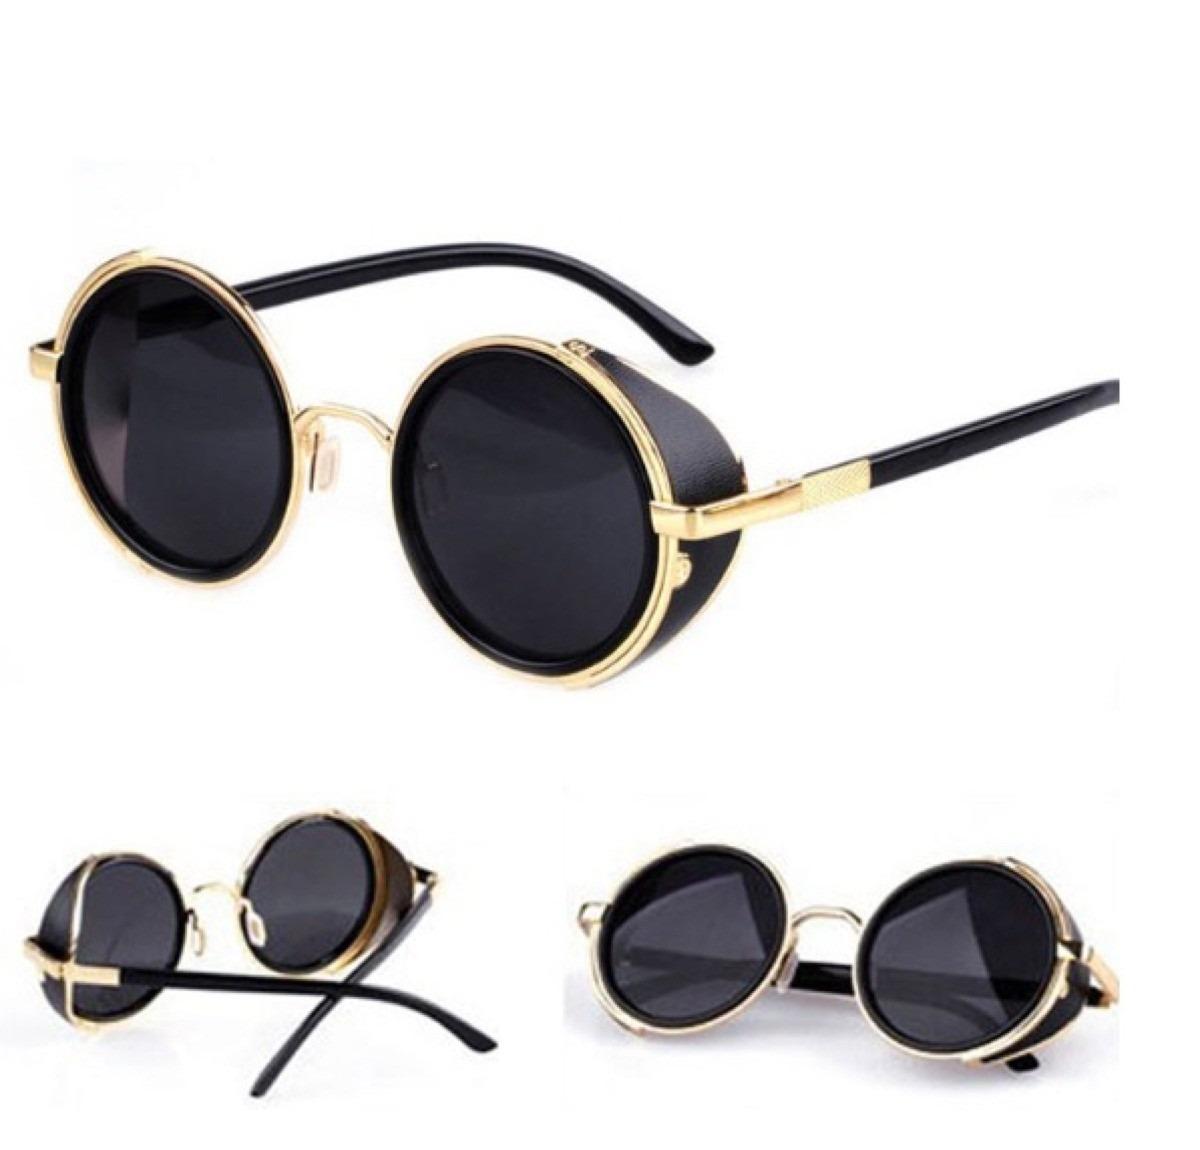 oculos sol redondo retro vintage lennon ozzy homem de ferro. Carregando  zoom. 30005b4975